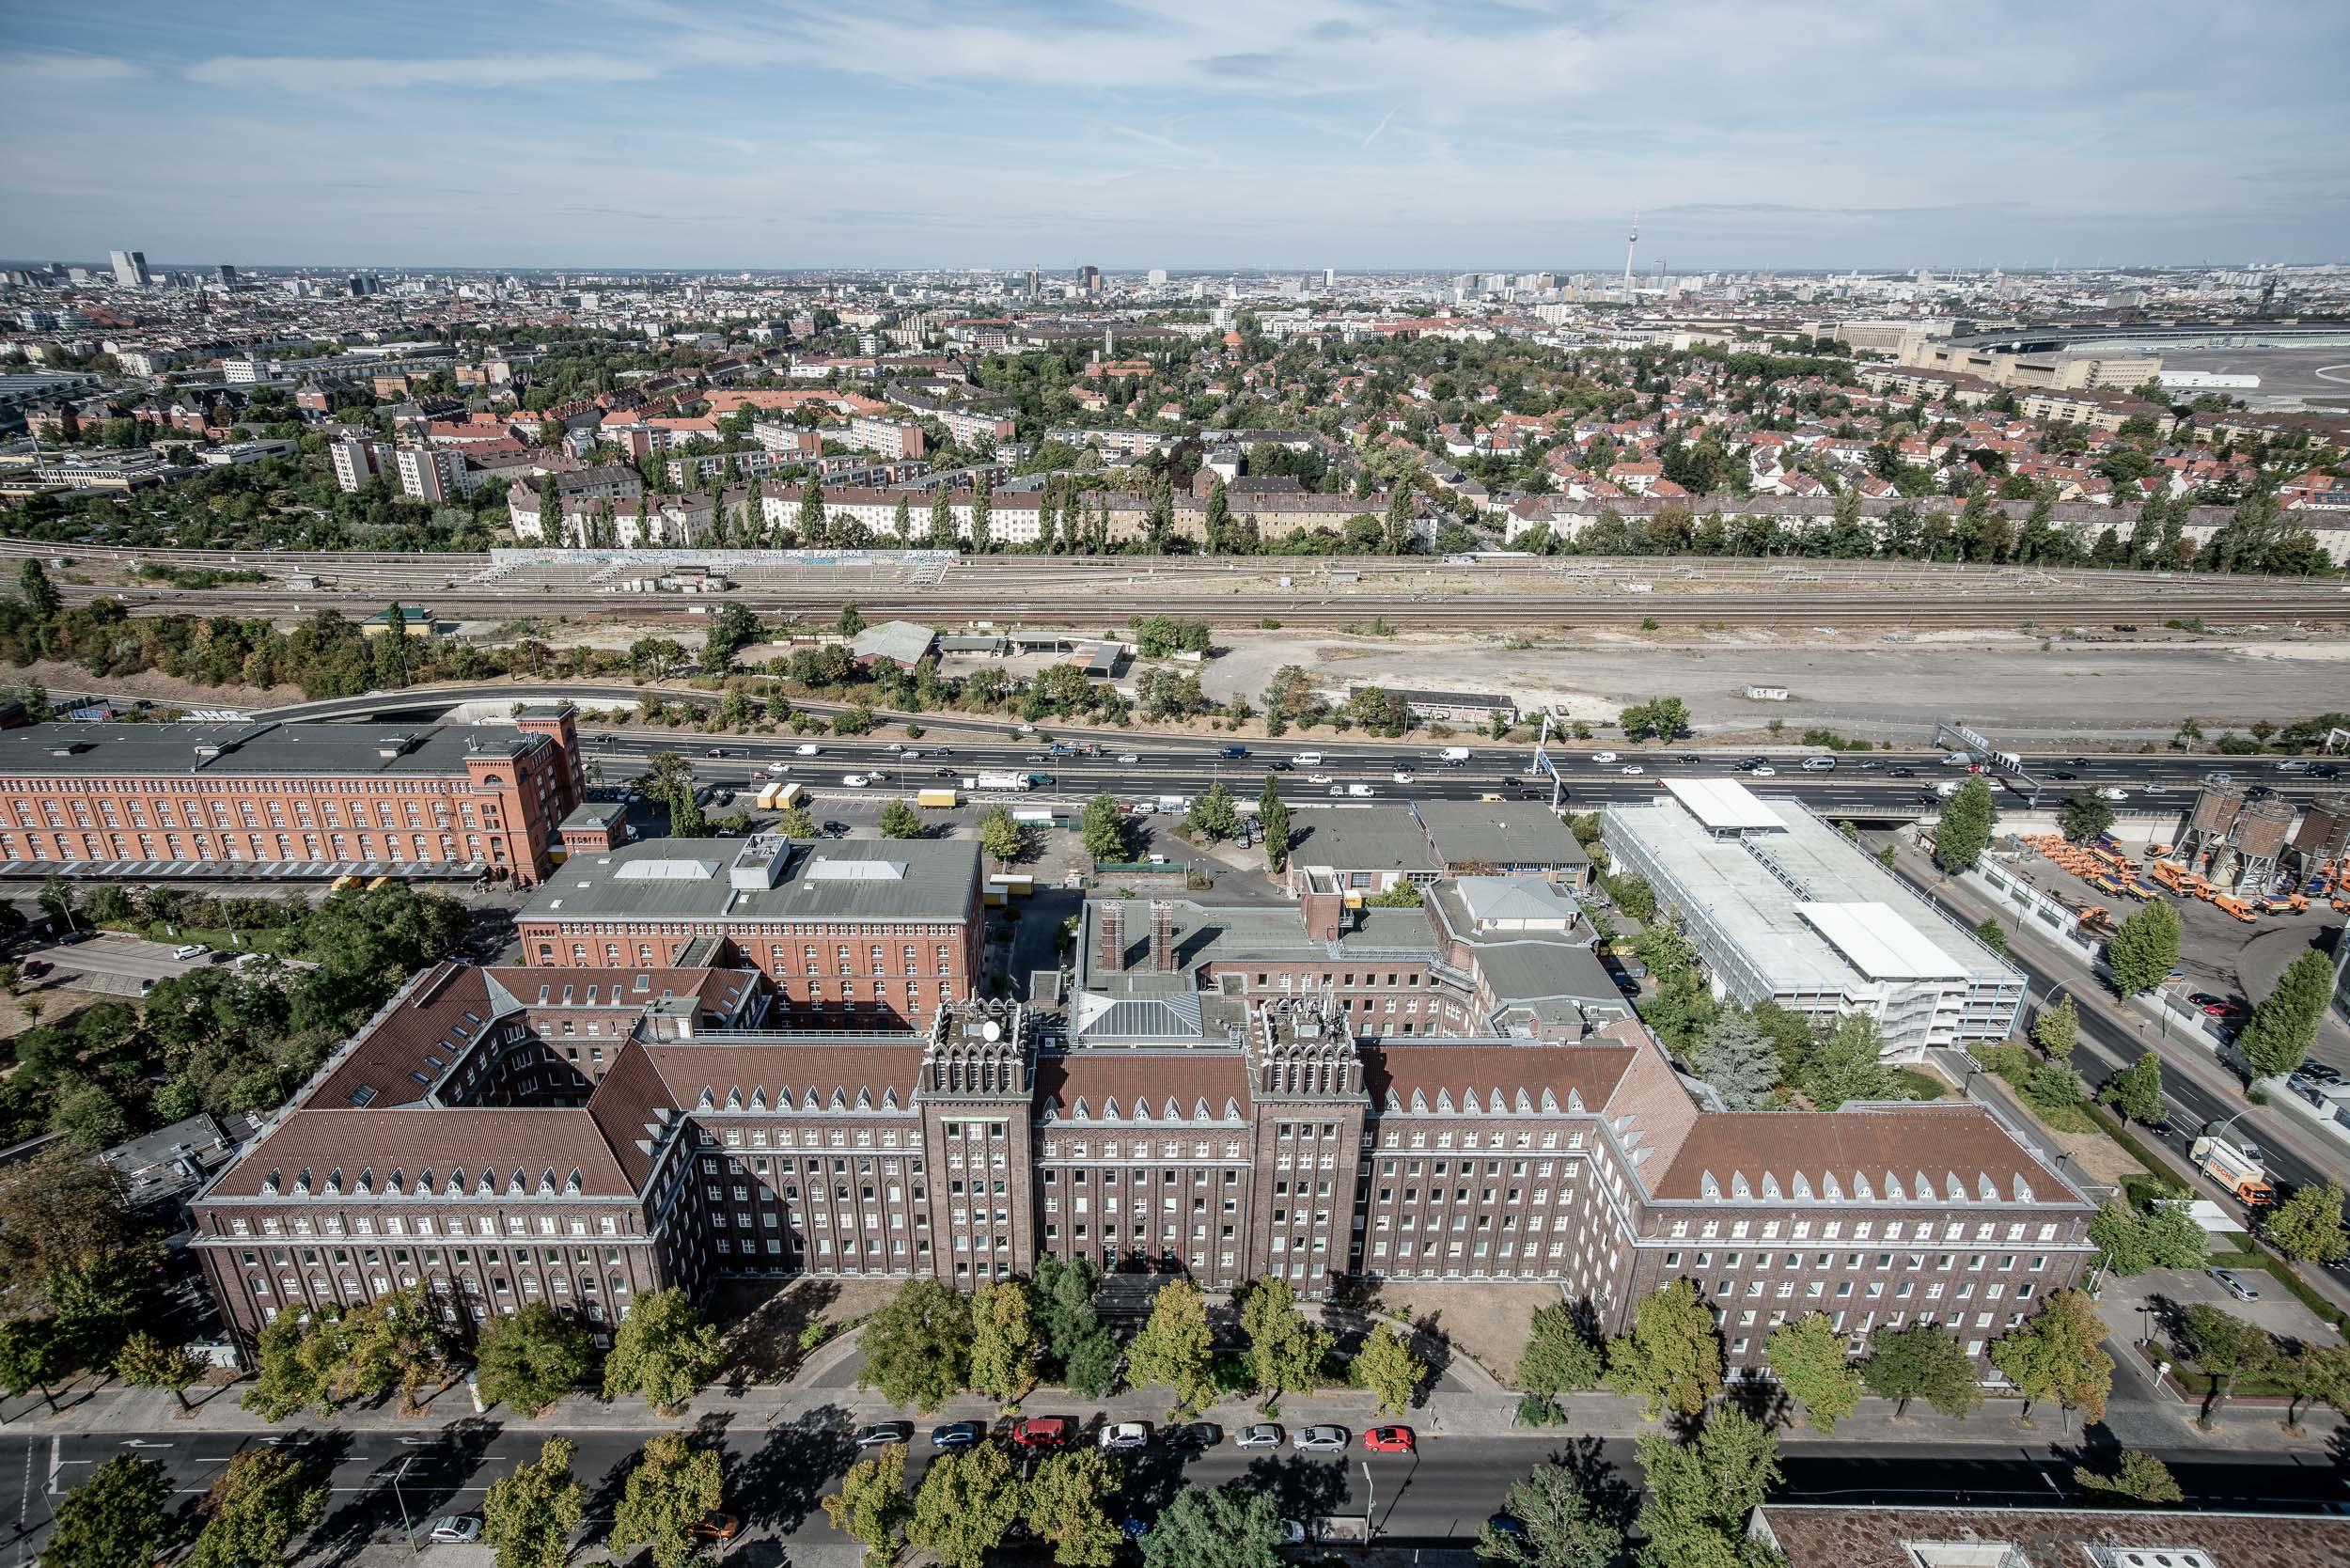 Ringbahnstraße Berlin - Luftbild gesamtes Gebäude